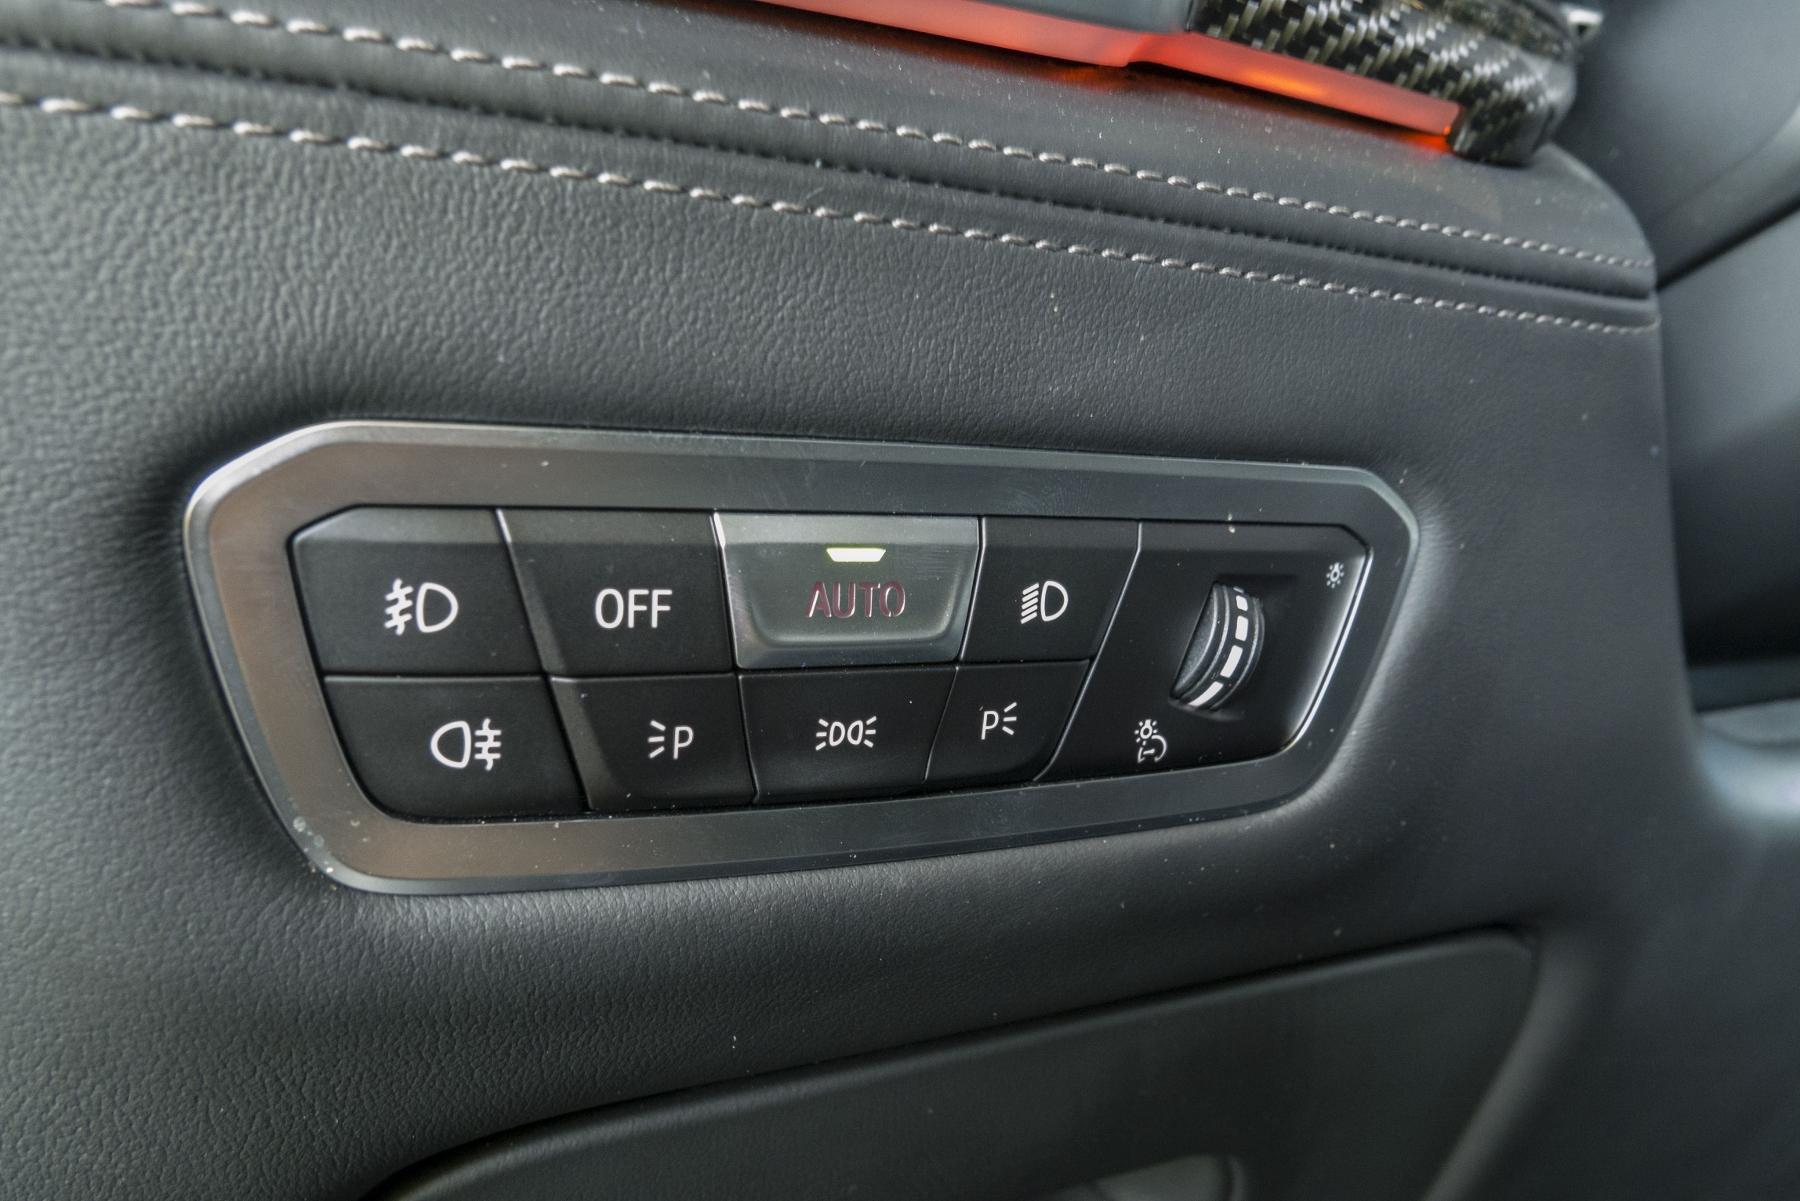 Test: BMW X6 M50i napína benzínové svaly, ale neukazuje plnú silu NI8Cdqv5ZI bmw-x6-m50i-39